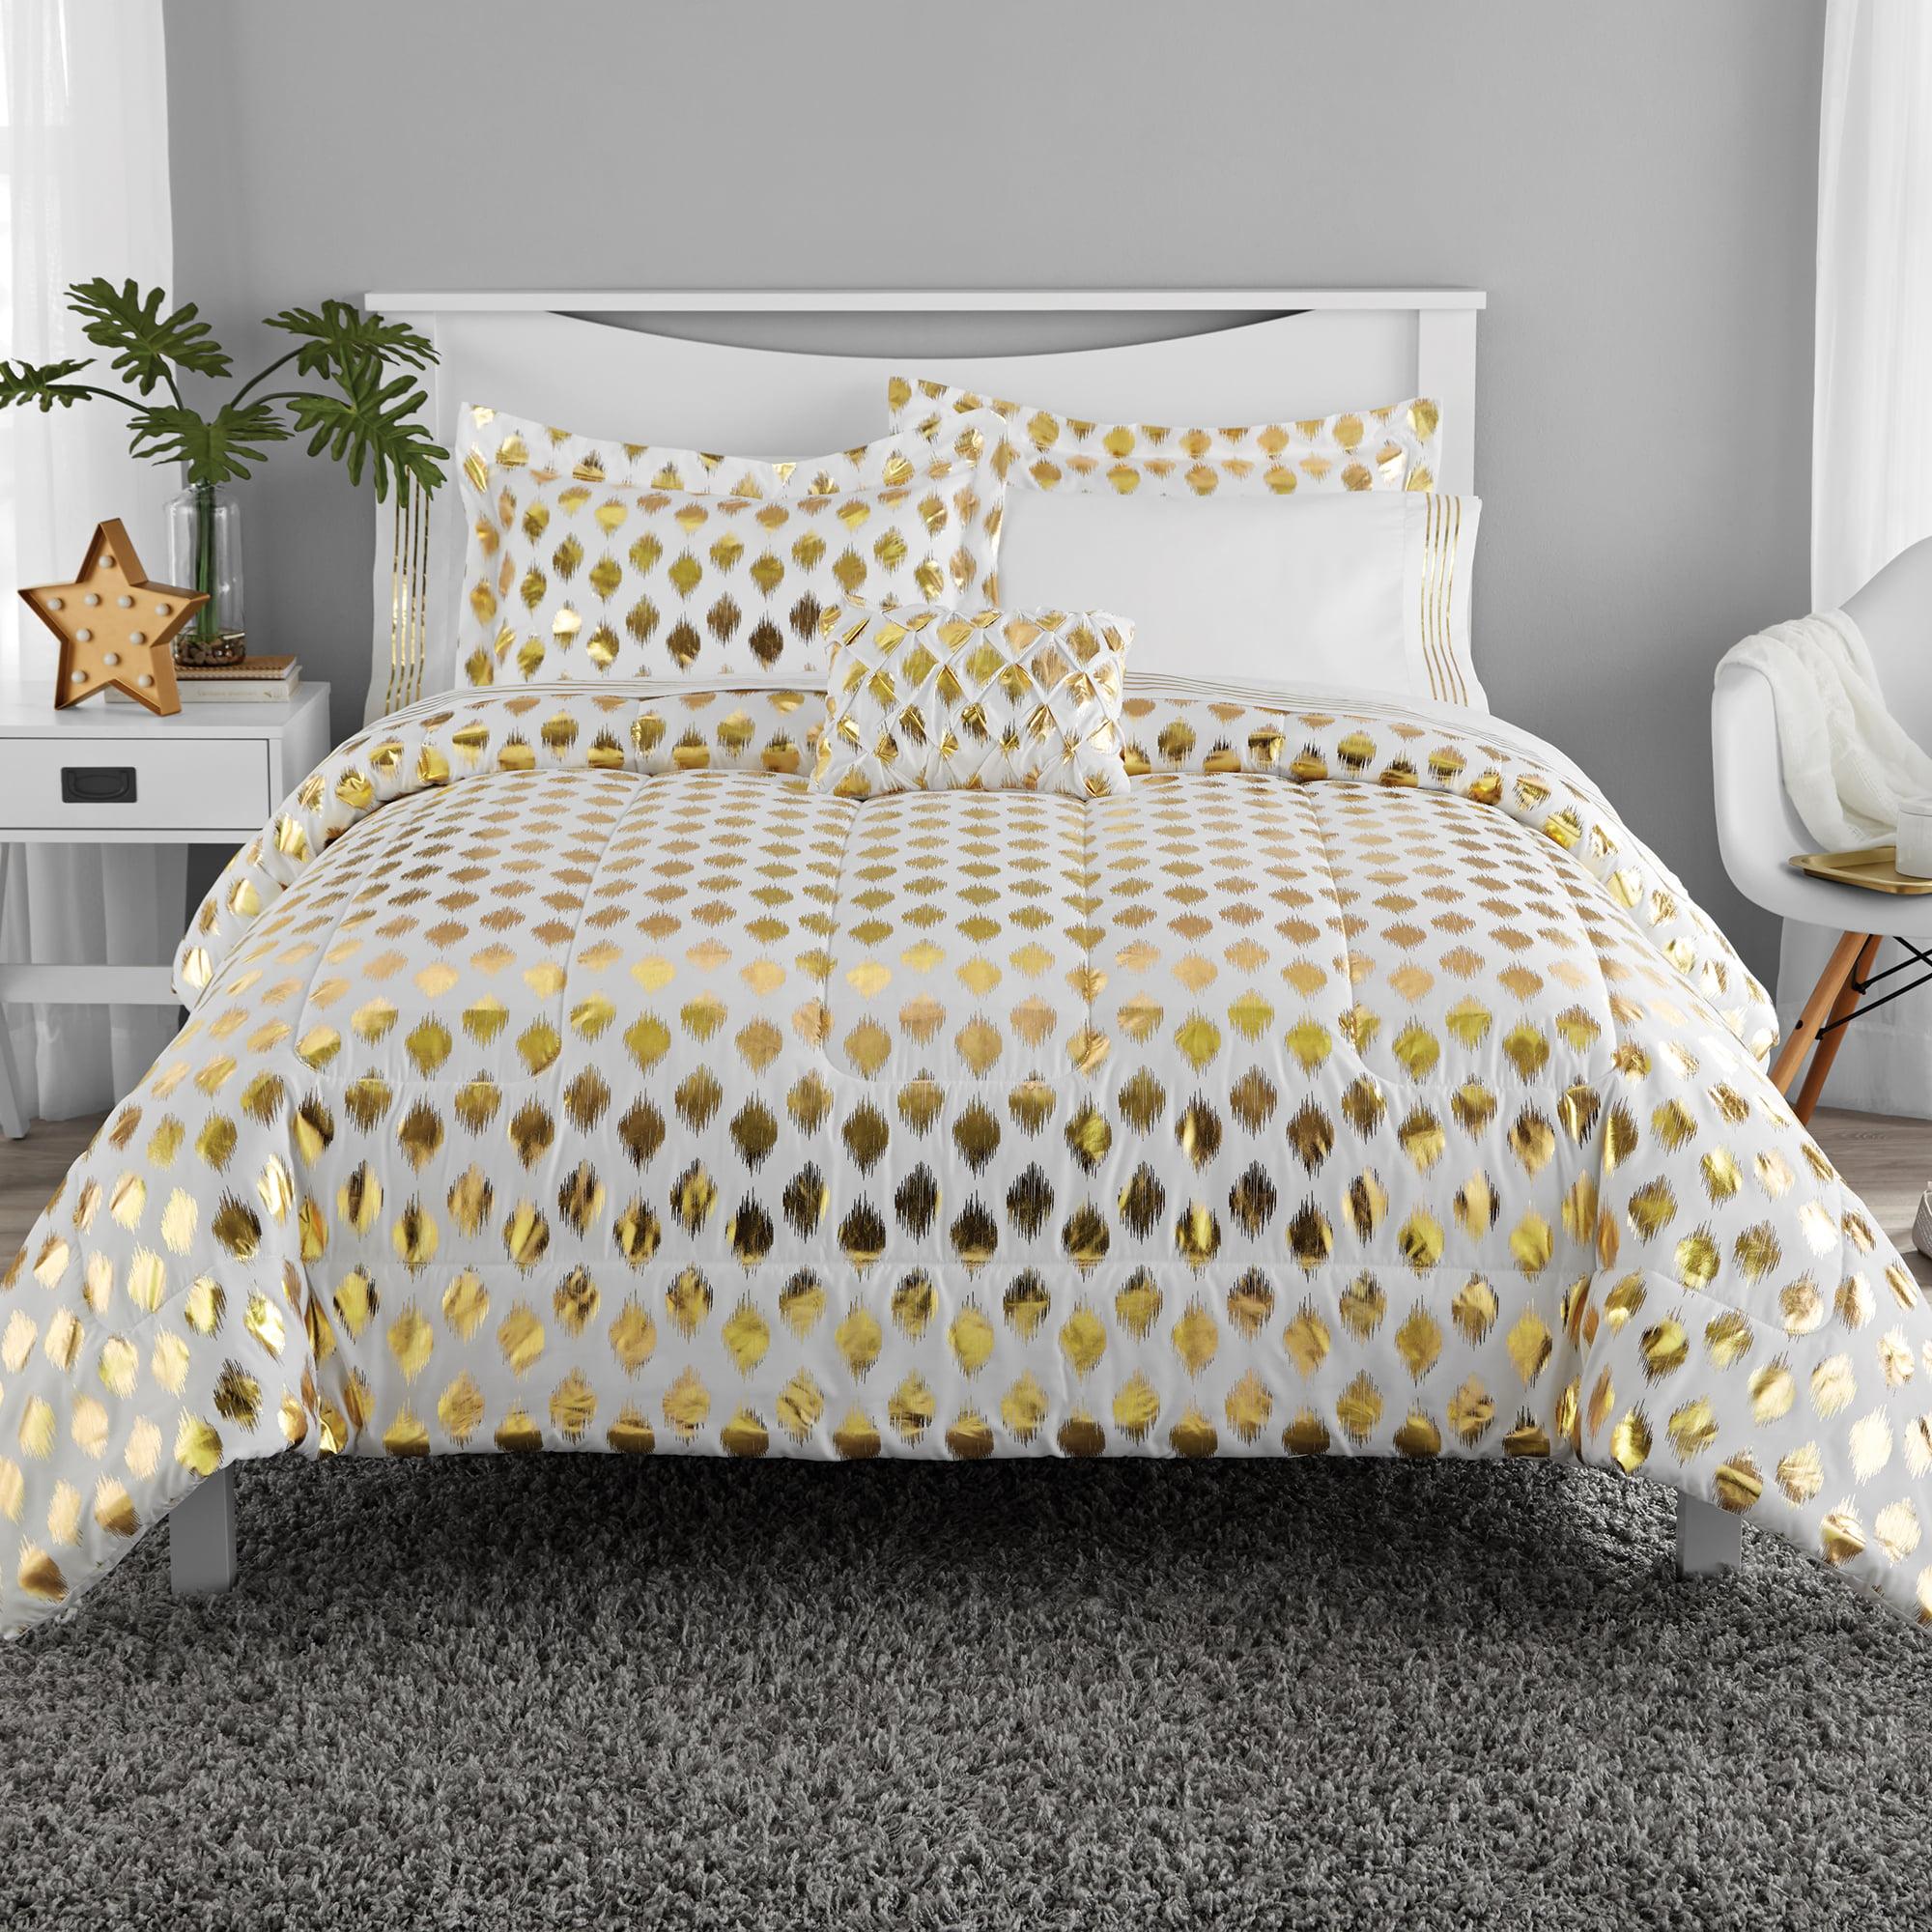 Mainstays Gold Dot Bed In A Bag Bedding Full Walmart Com